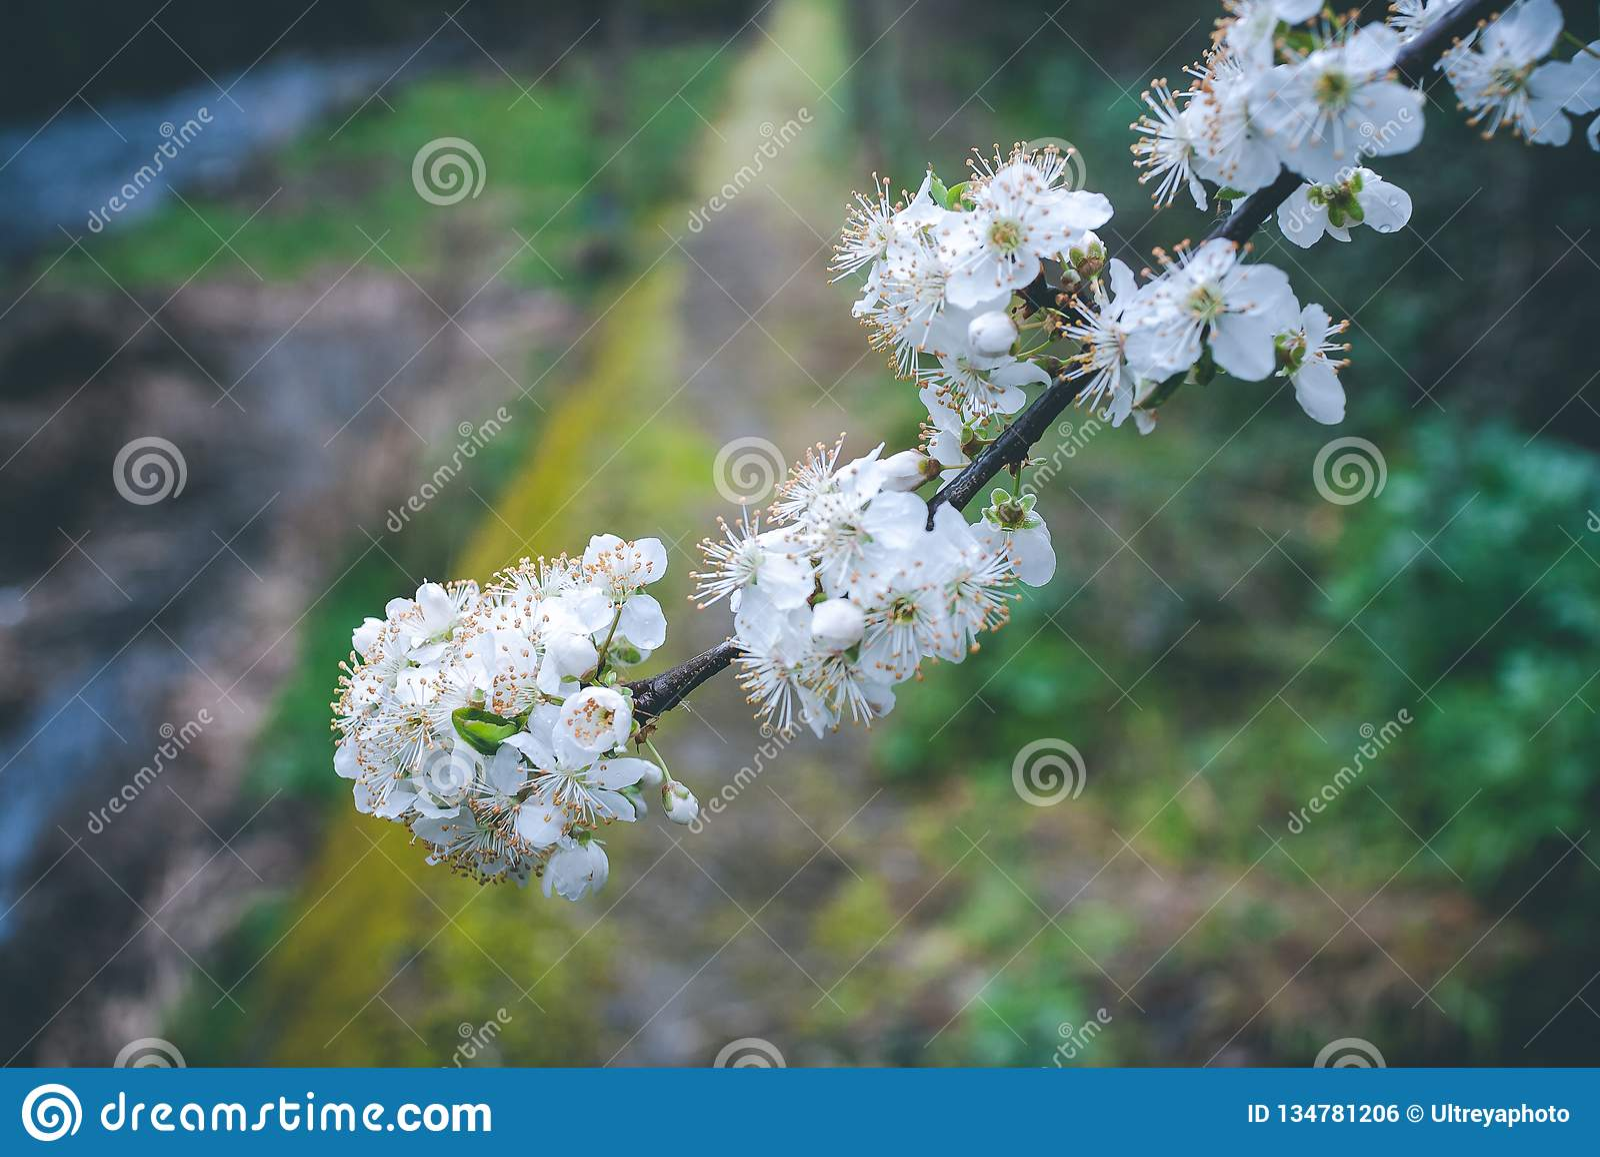 Almond tree flourished in Springtime